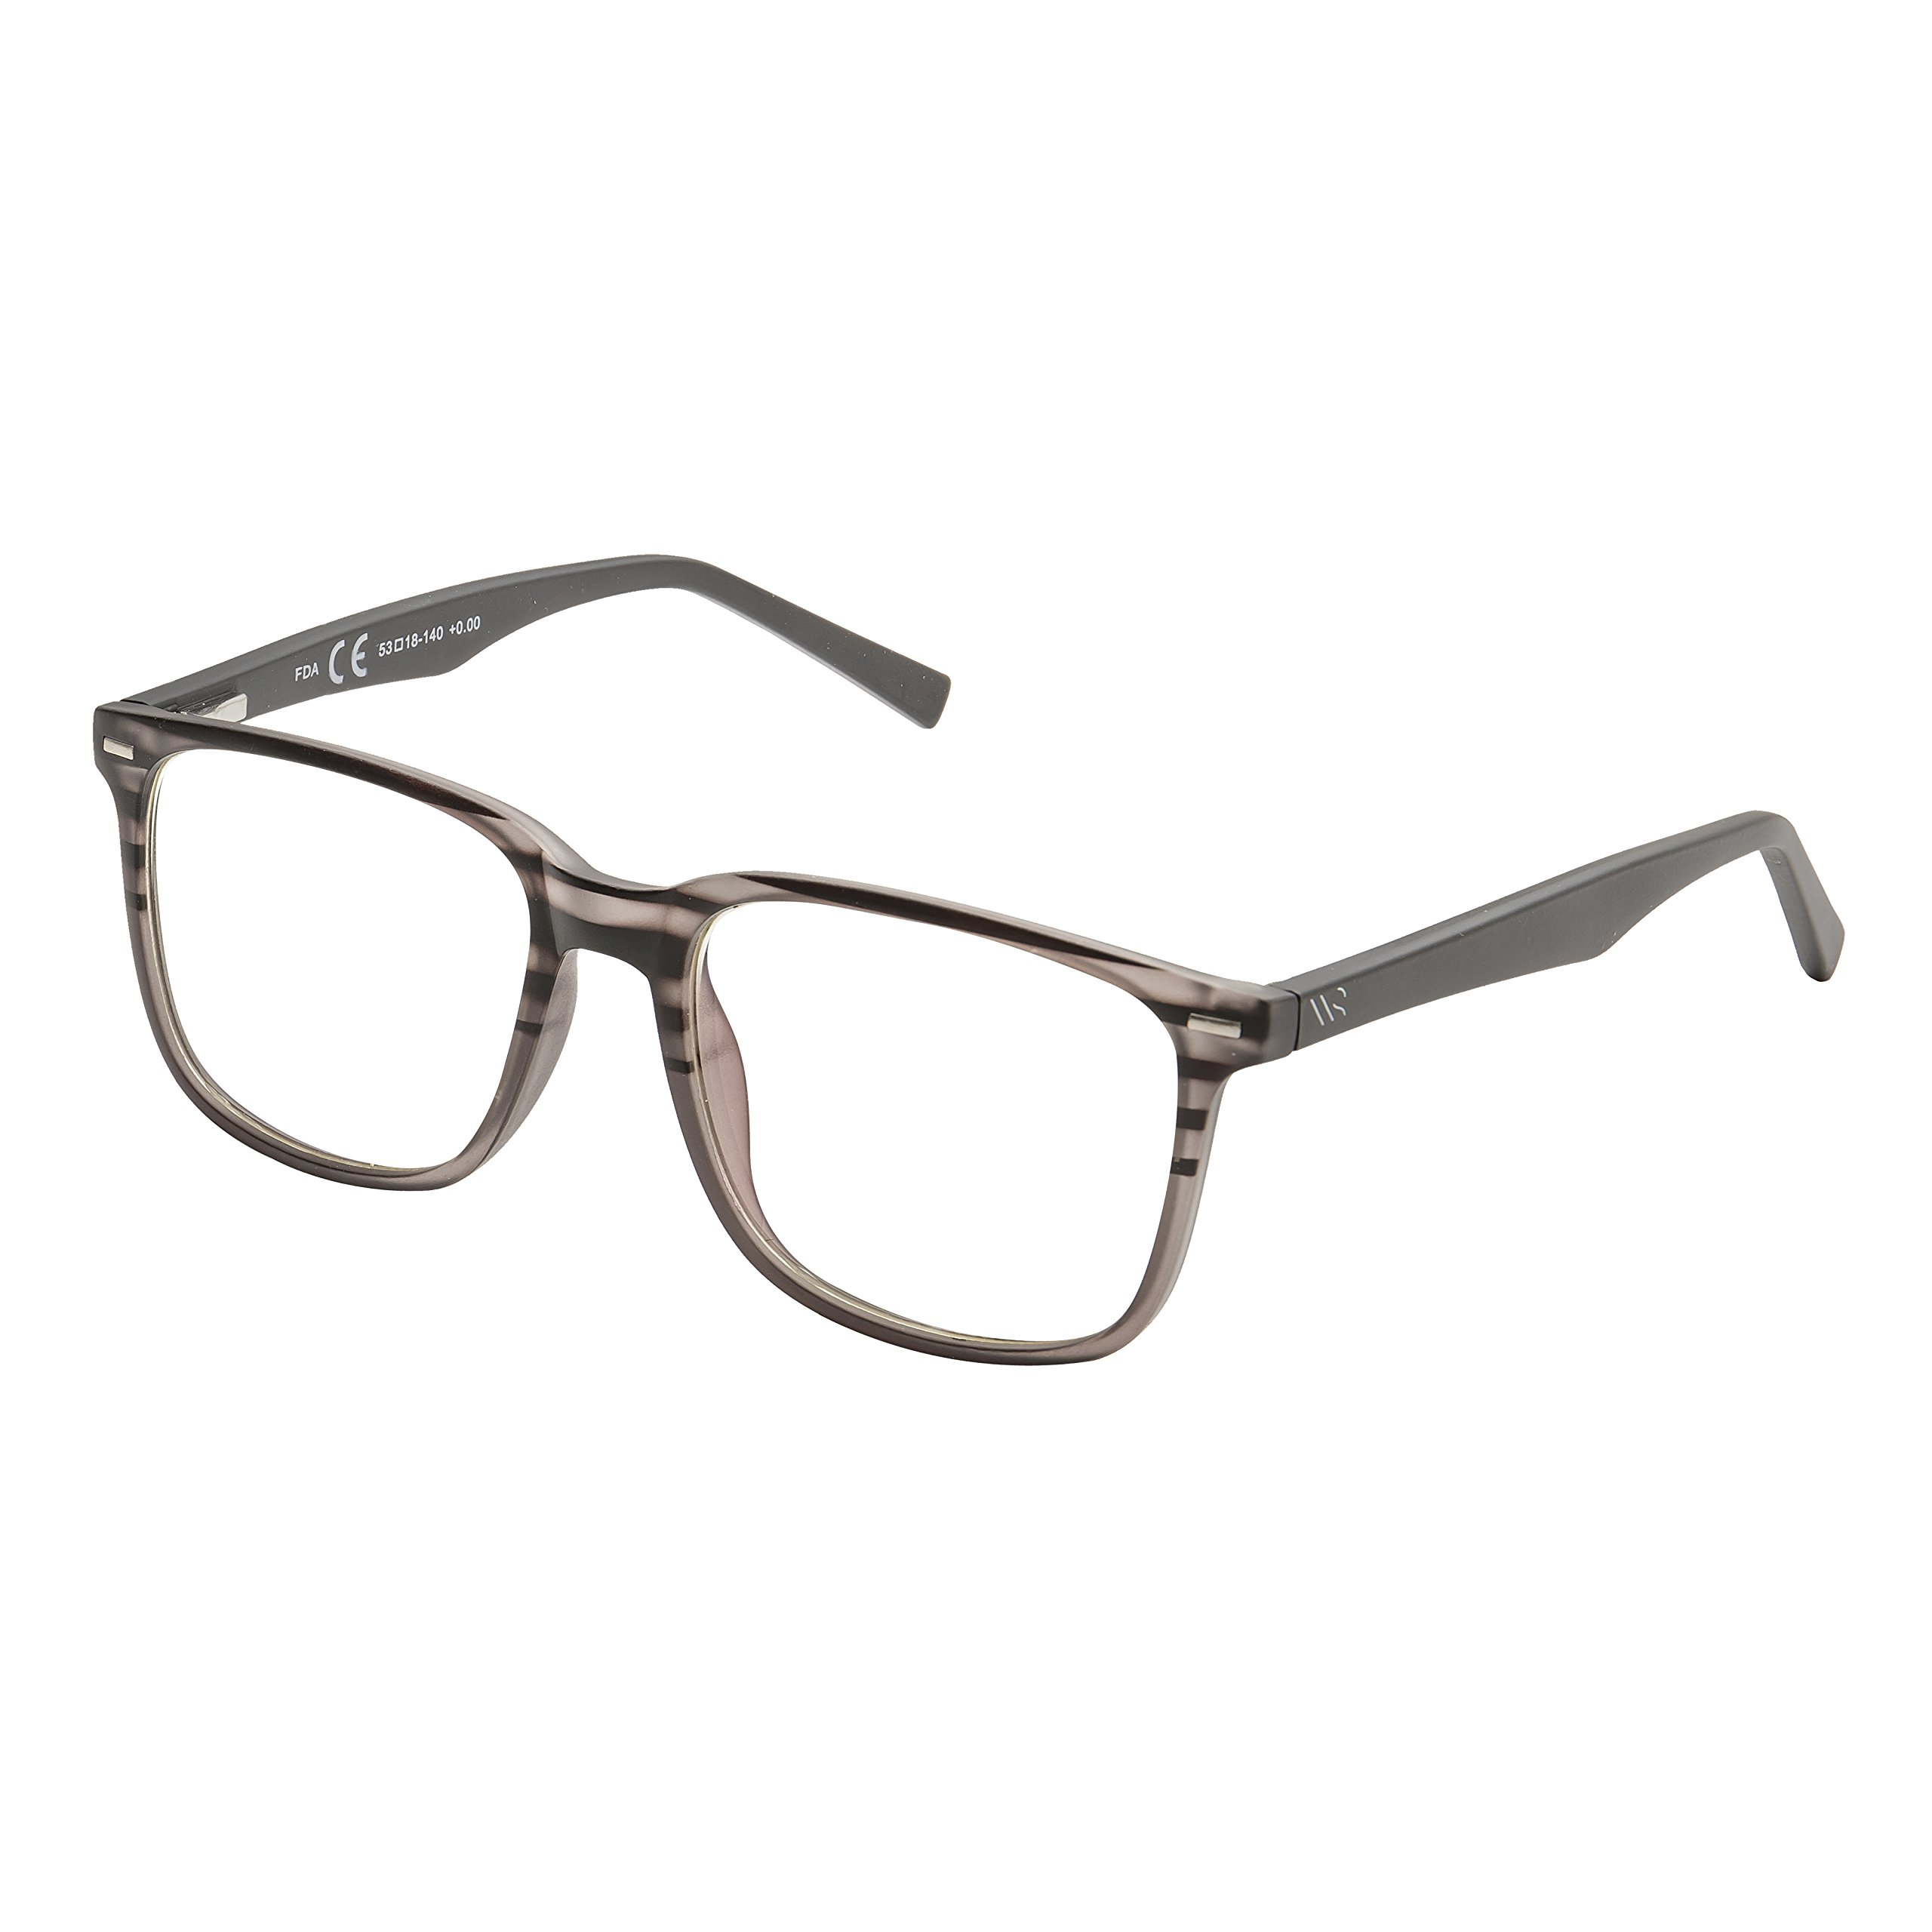 6a181b6ff68f Blue Light Blocking Glasses,Cut UV400 Transparent Lens,Computer Reading  Glasses,Anti Eyestrain